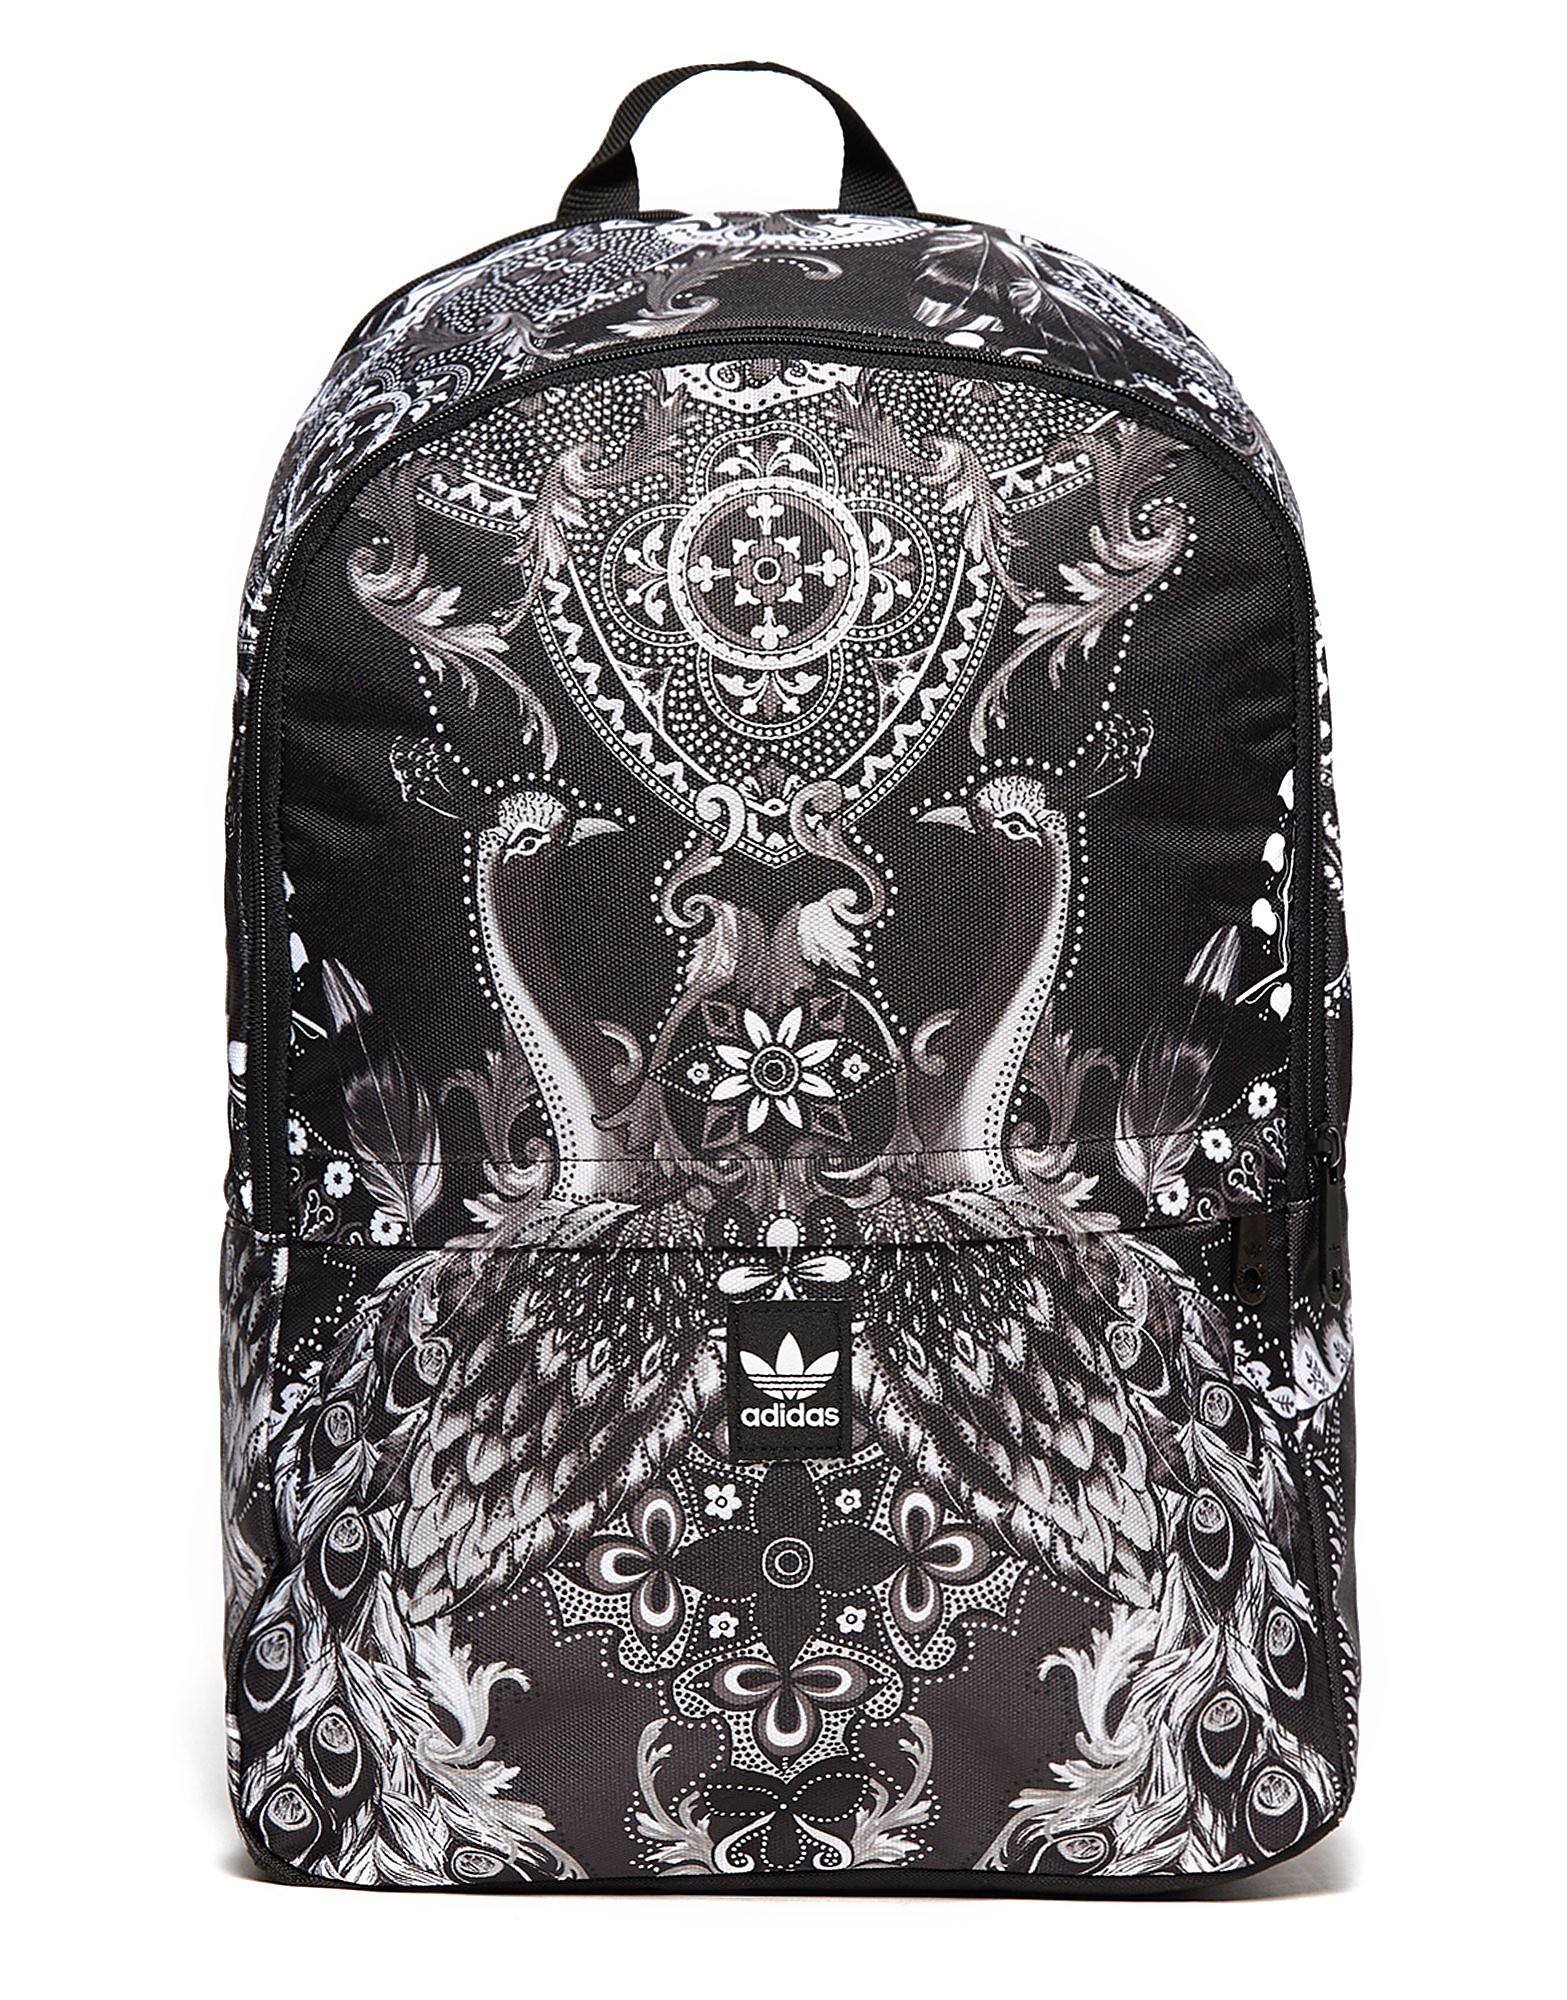 adidas Originals Essentials Pavao Backpack